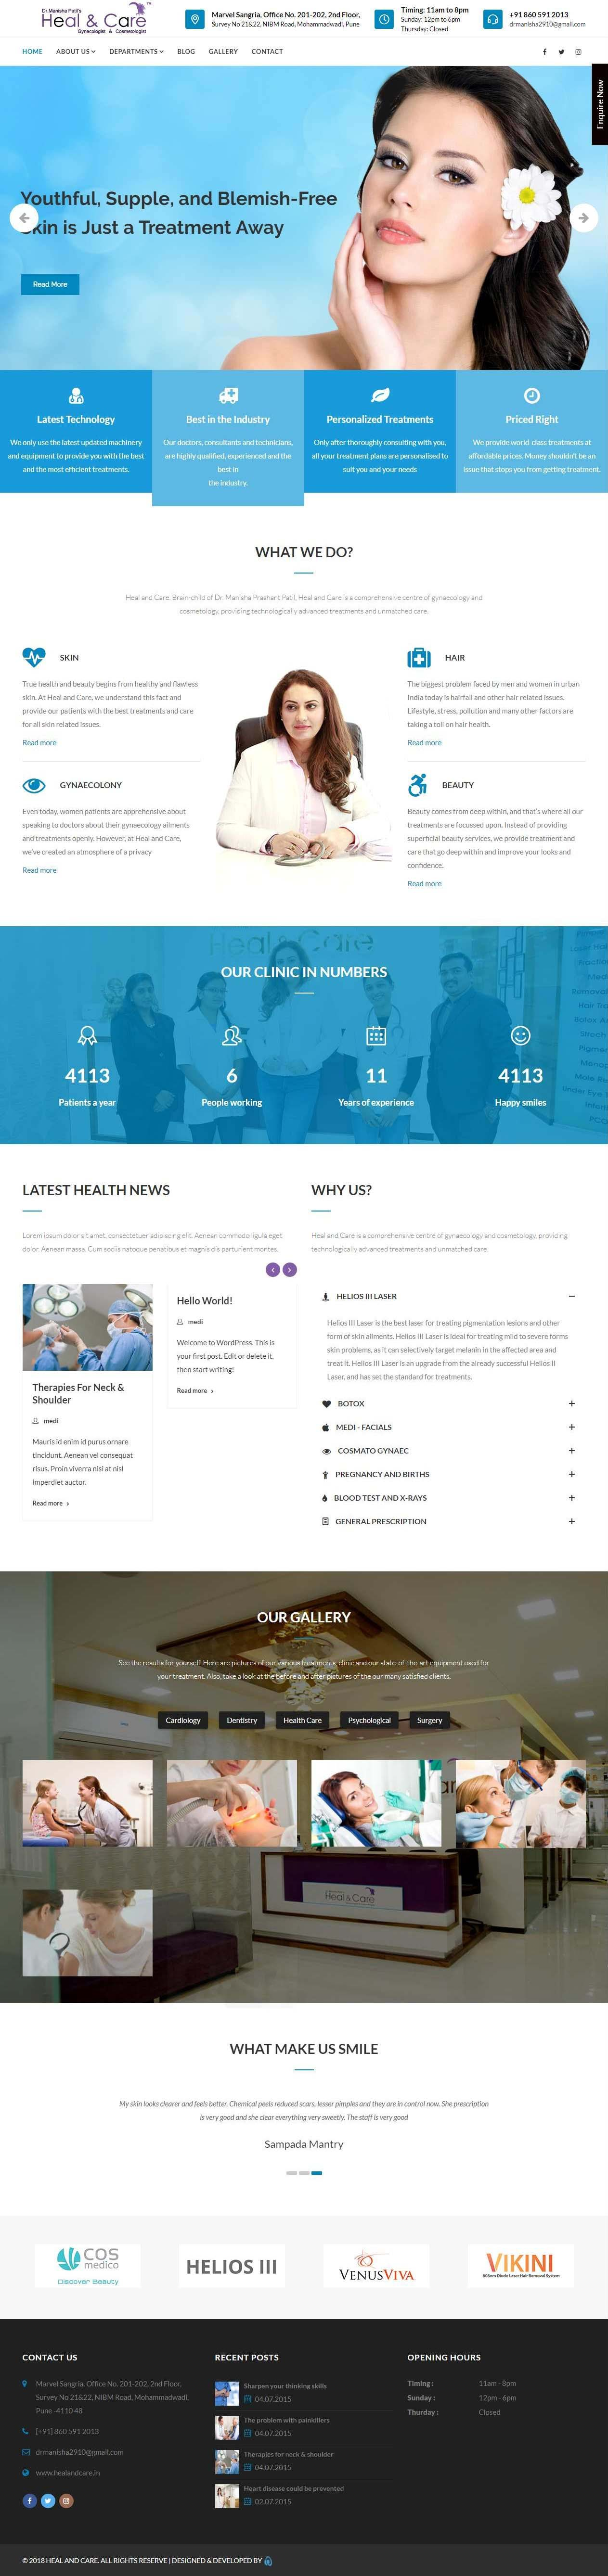 healandcare-website-screenshot